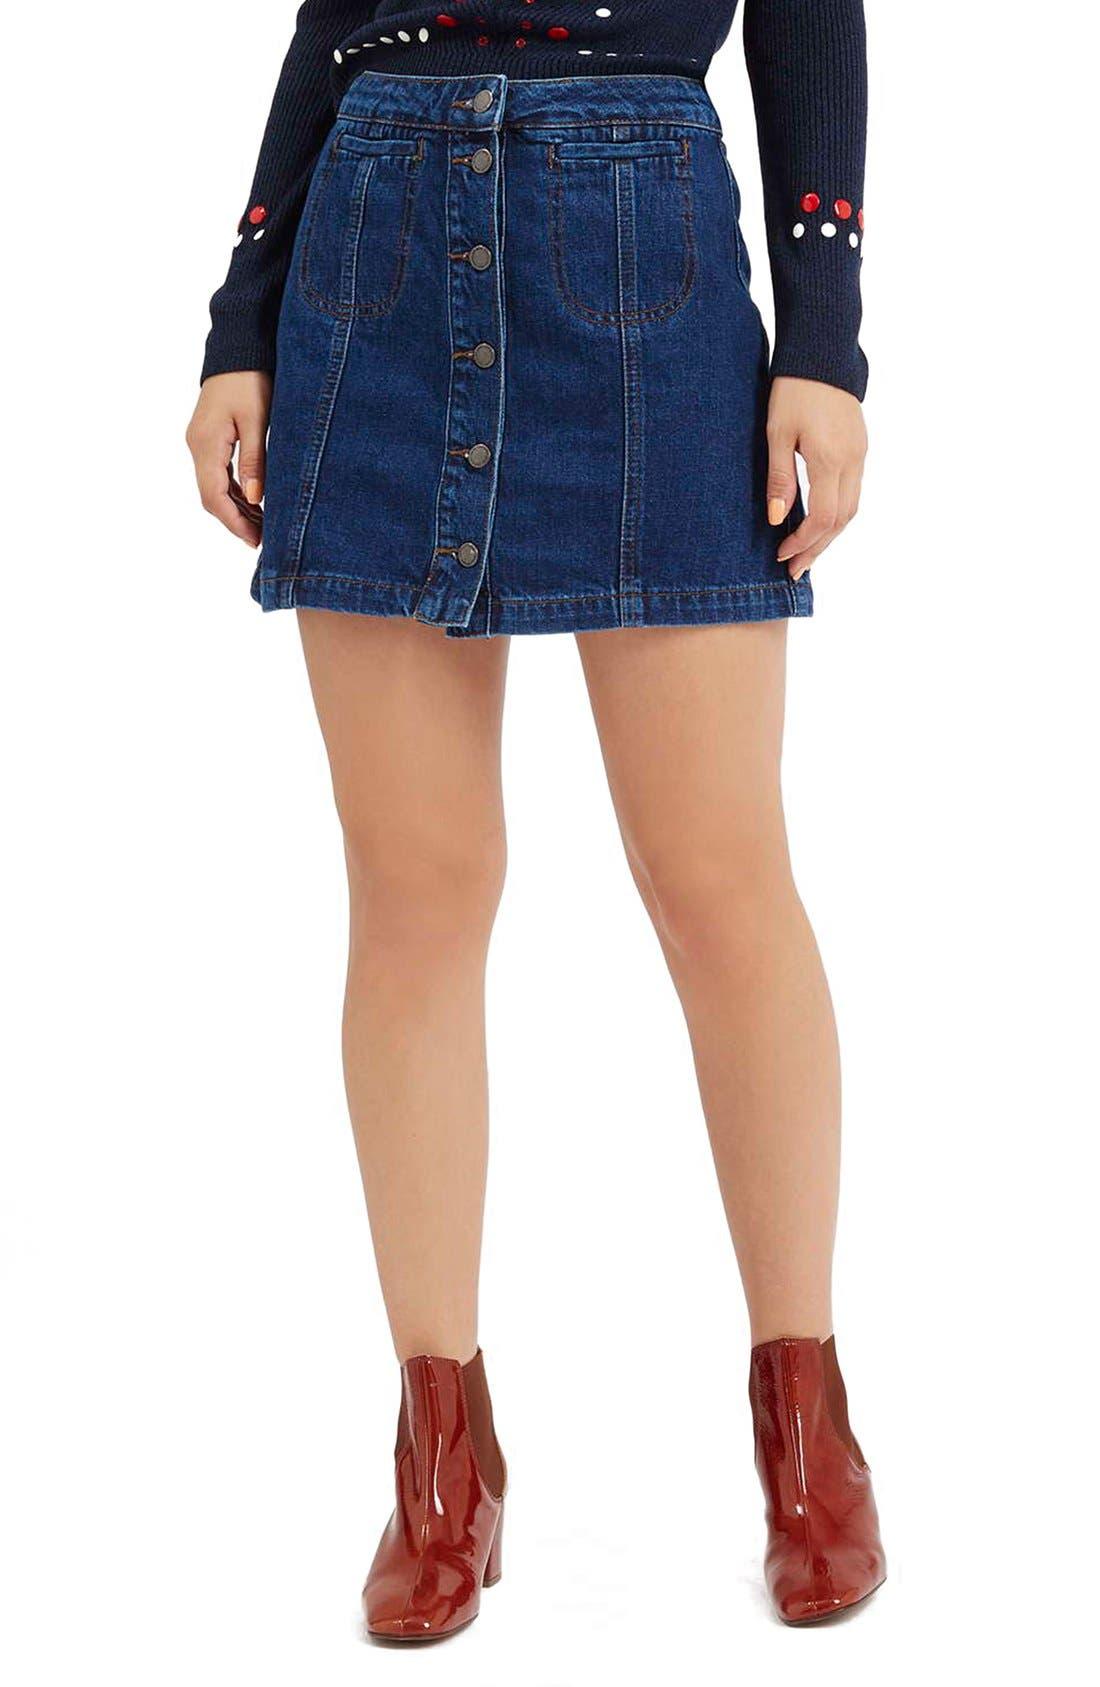 Alternate Image 1 Selected - TopshopButton Front Denim Skirt